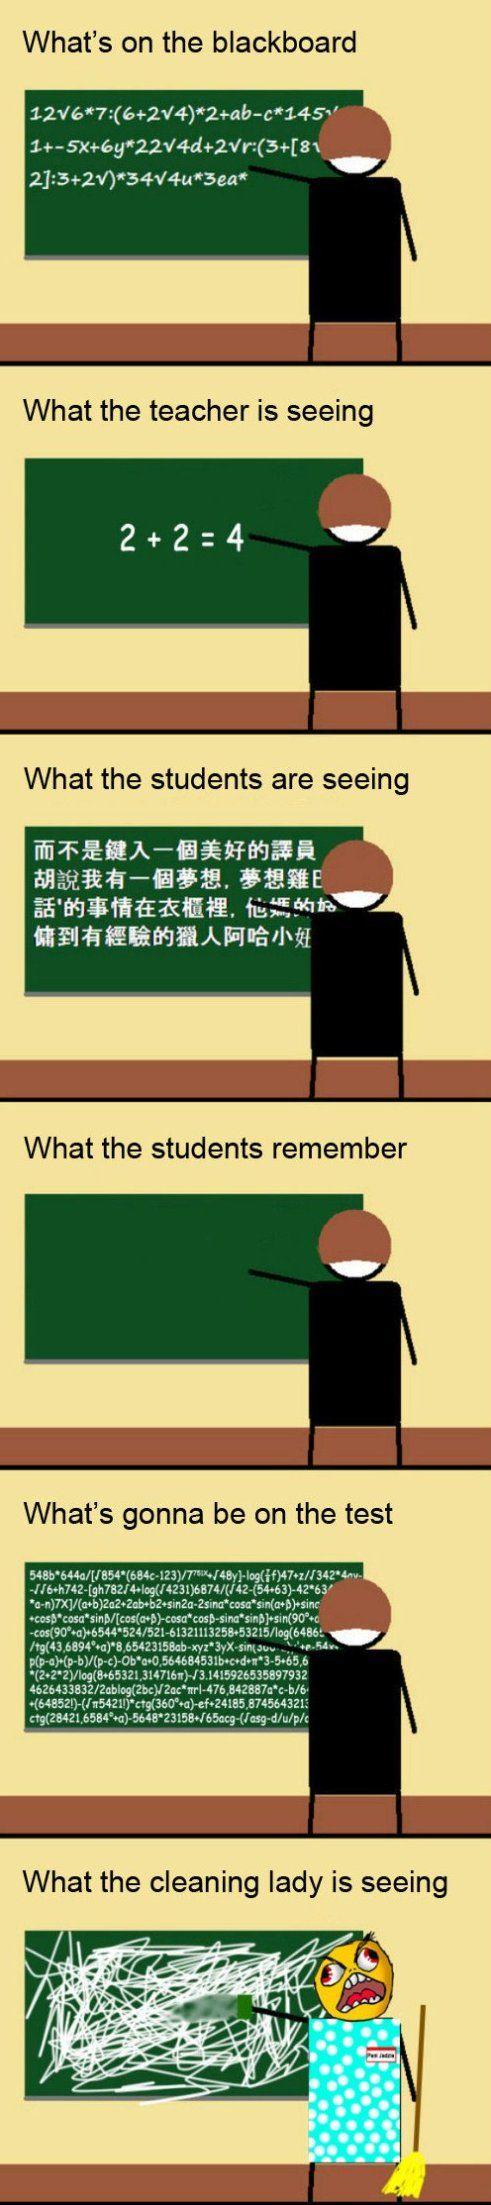 College Teacher Blackboard meme lol memes